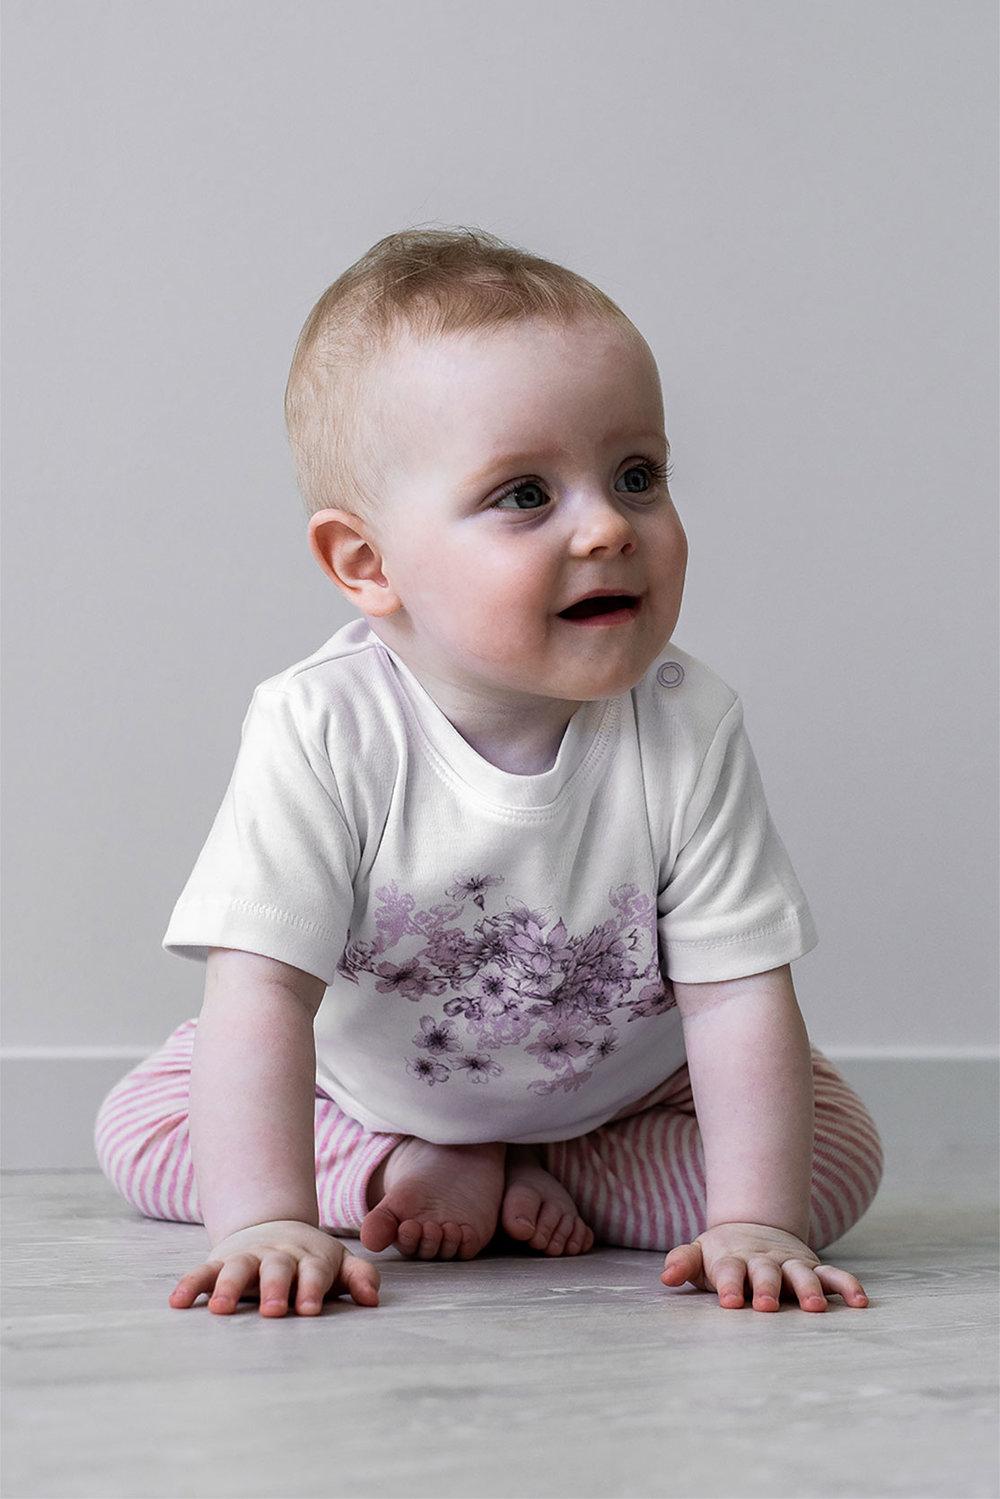 Fin baby t-shirt med tryck av blommor. Knappar på axeln. @luckimibrand Luckimi